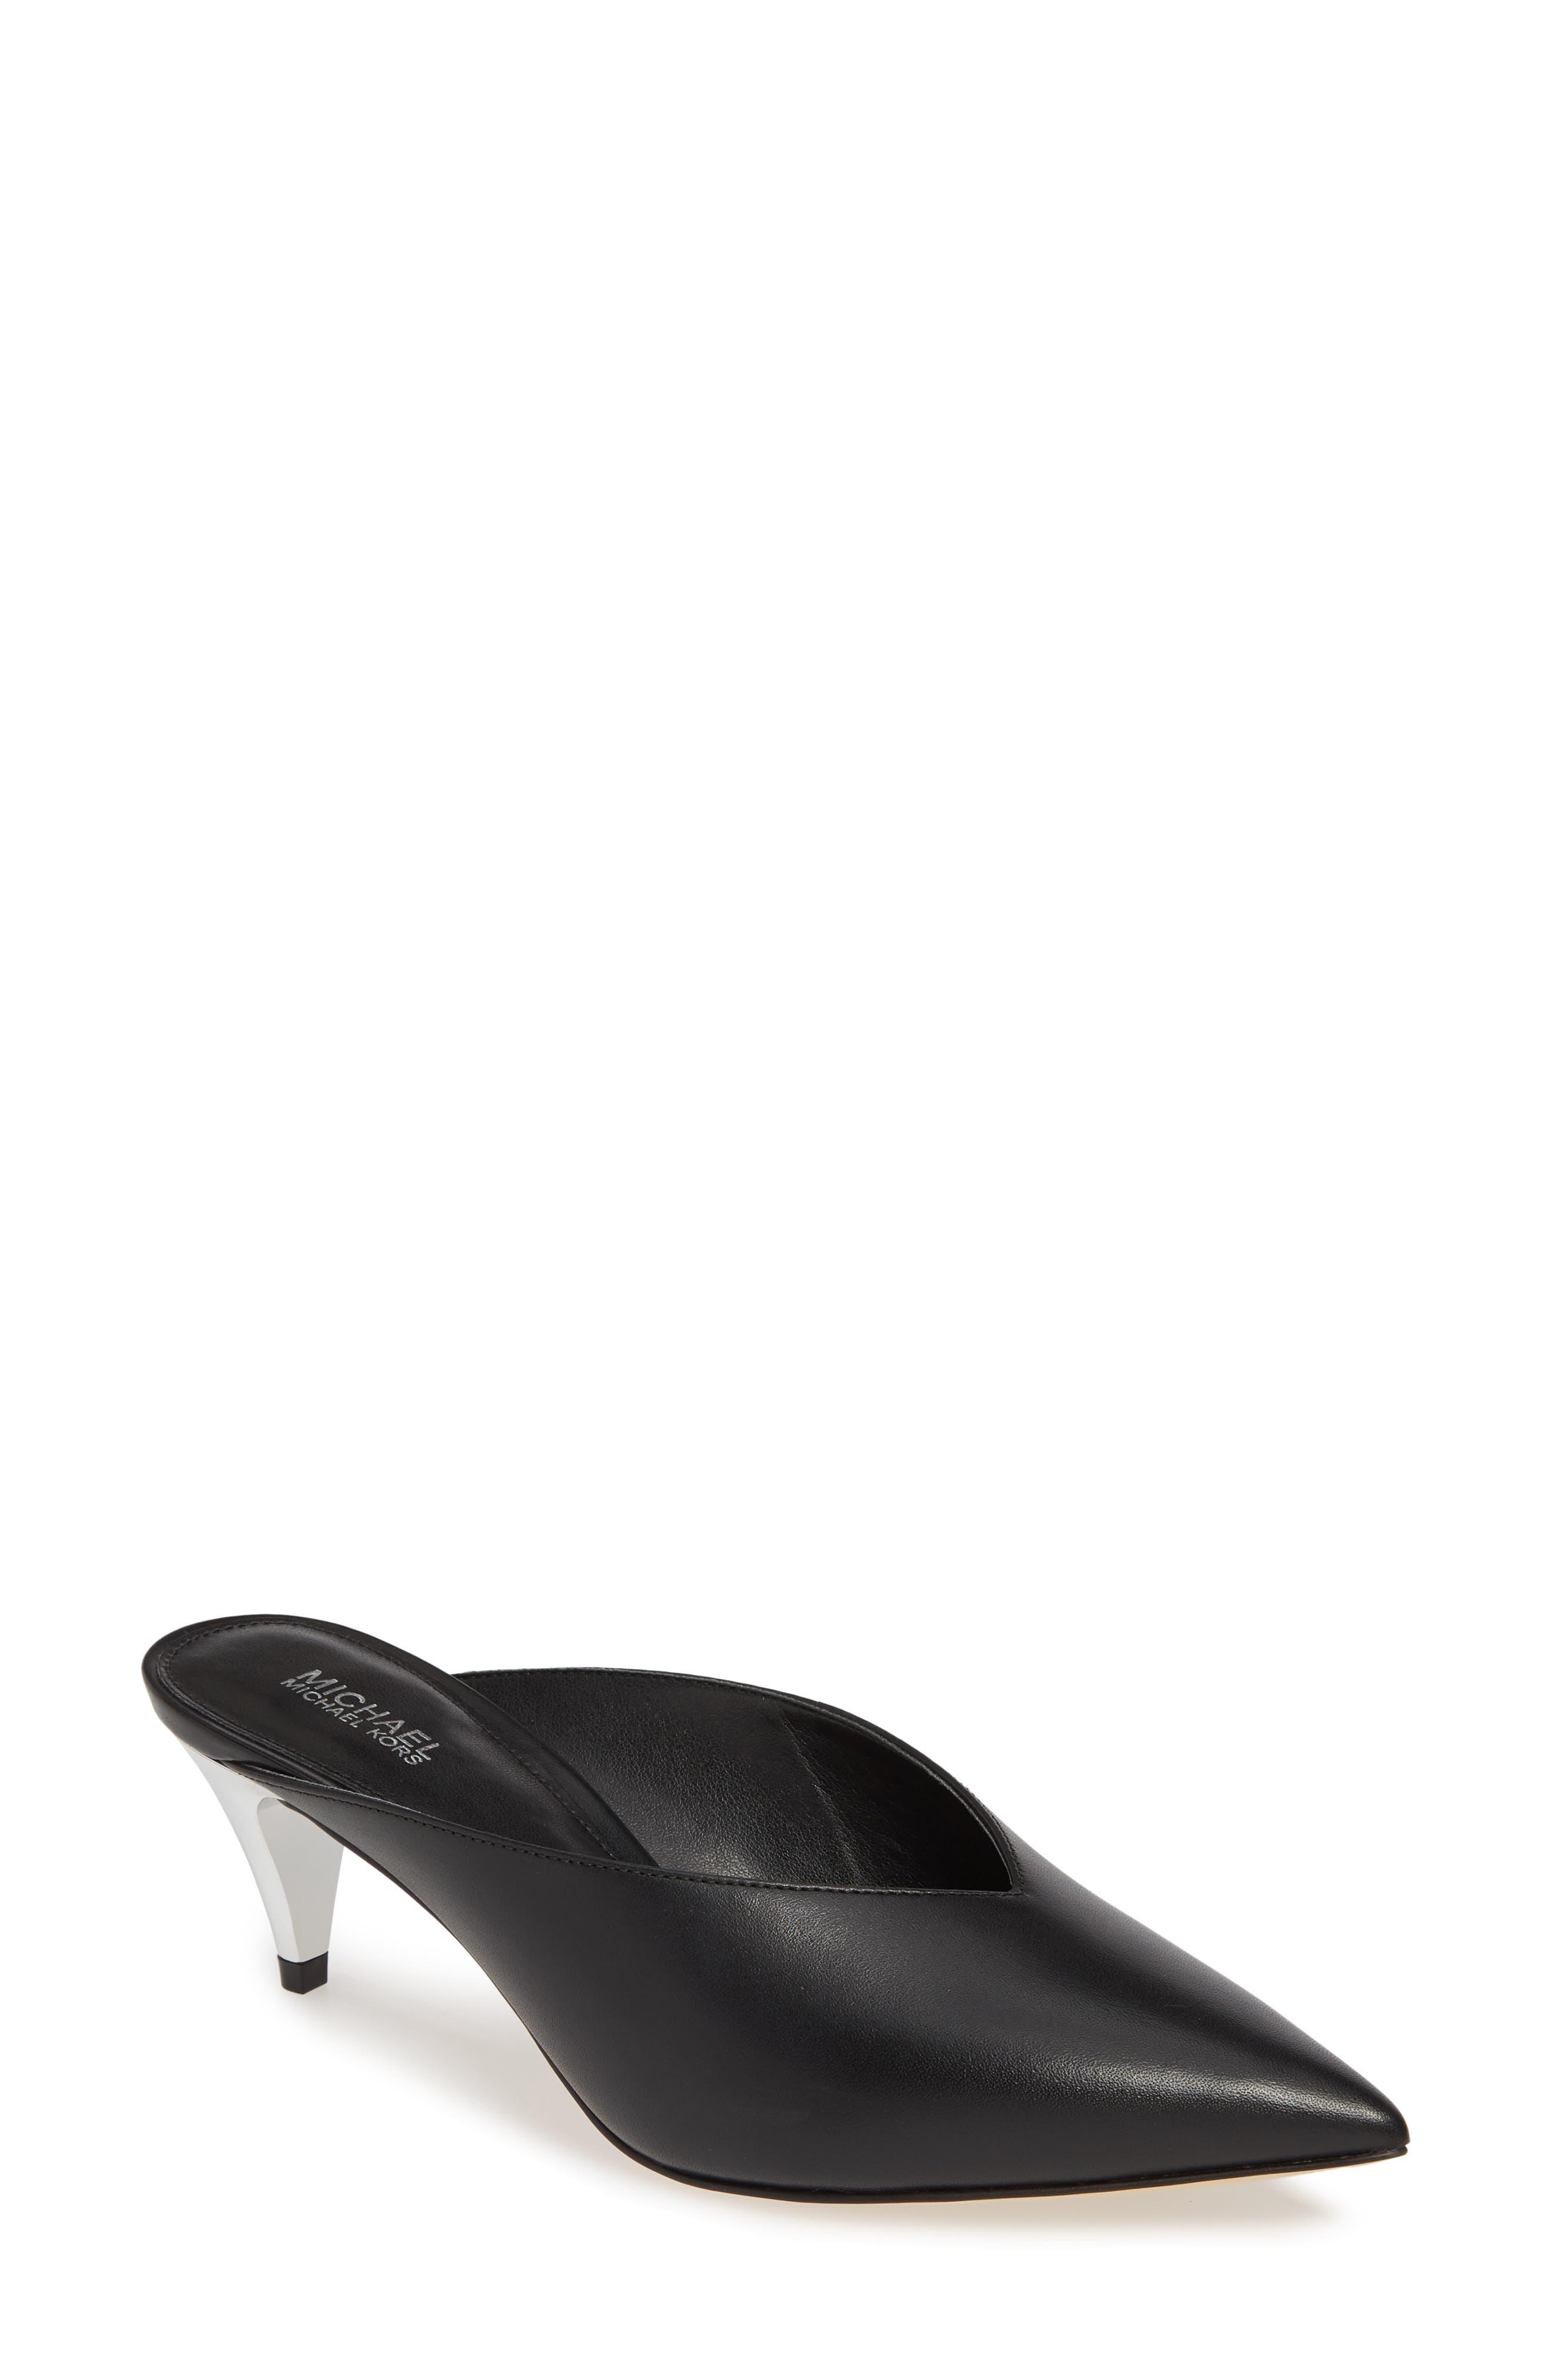 Cambria Mule,                             Main thumbnail 1, color,                             BLACK VACHETTA LEATHER